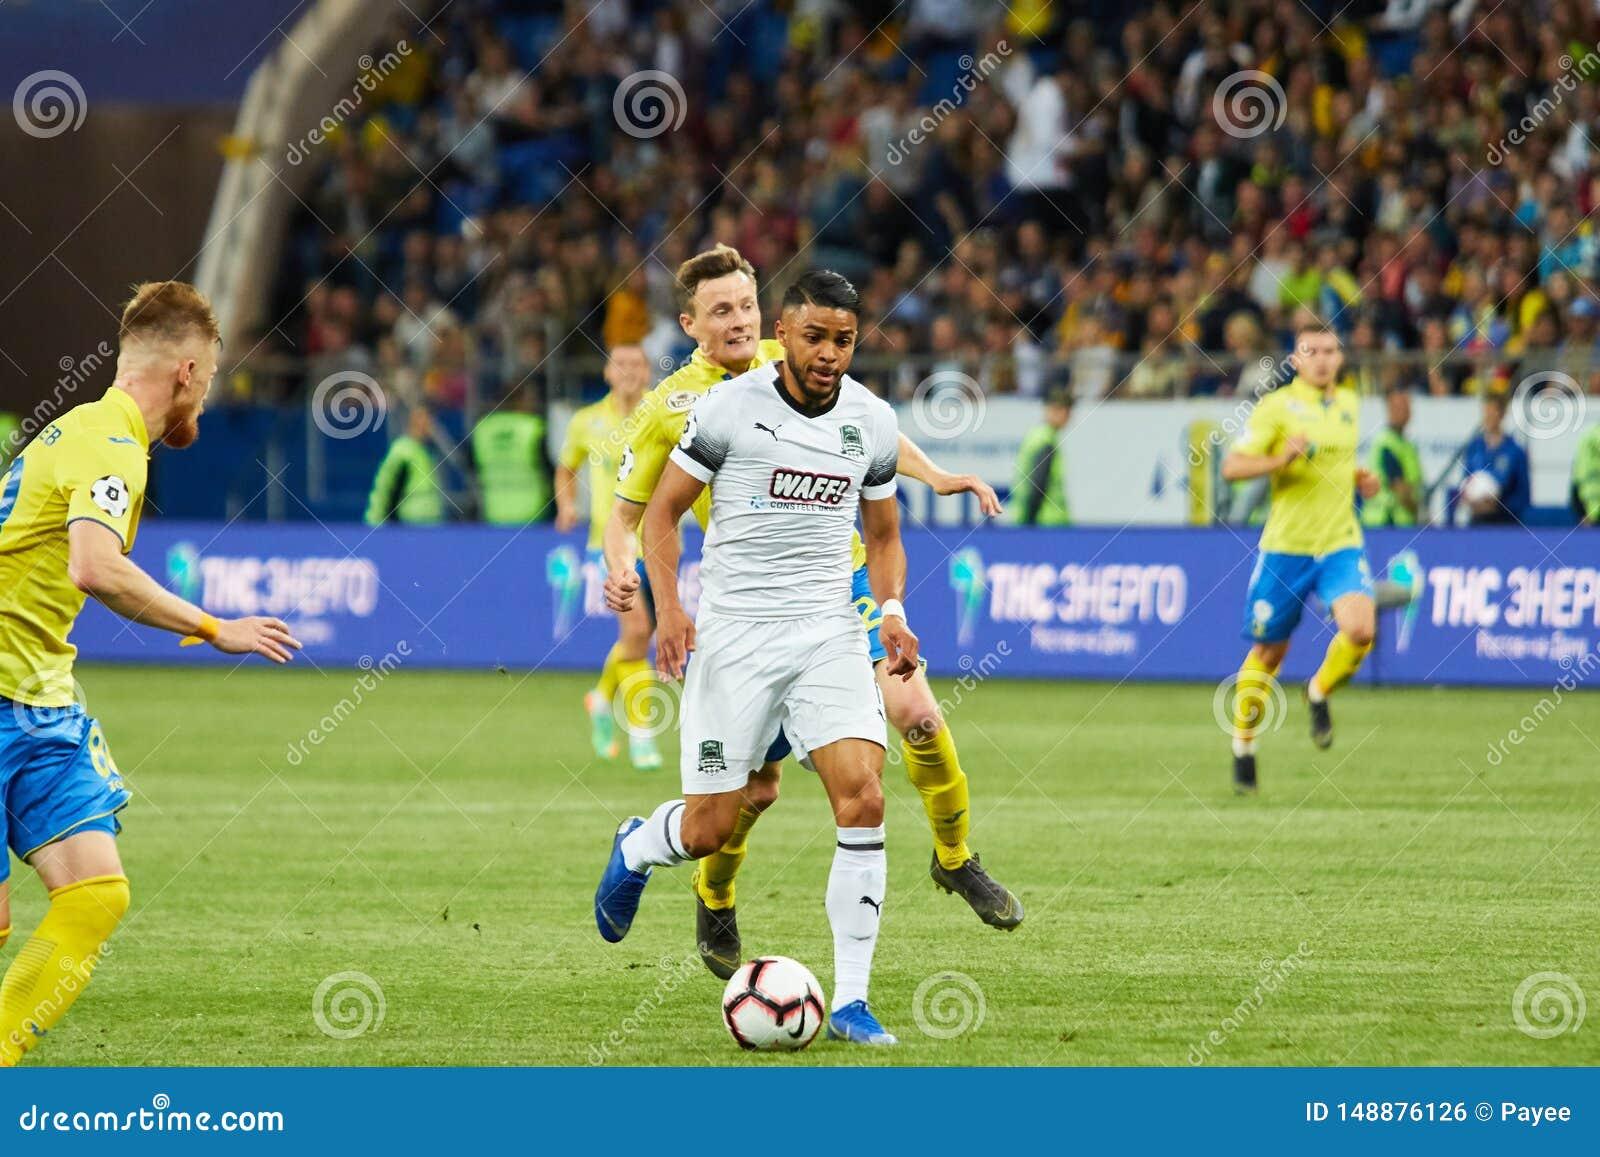 Wanderson Maciel Sousa Campos Of Fc Krasnodar Controls The Ball Editorial Photo Image Of Match Goal 148876126